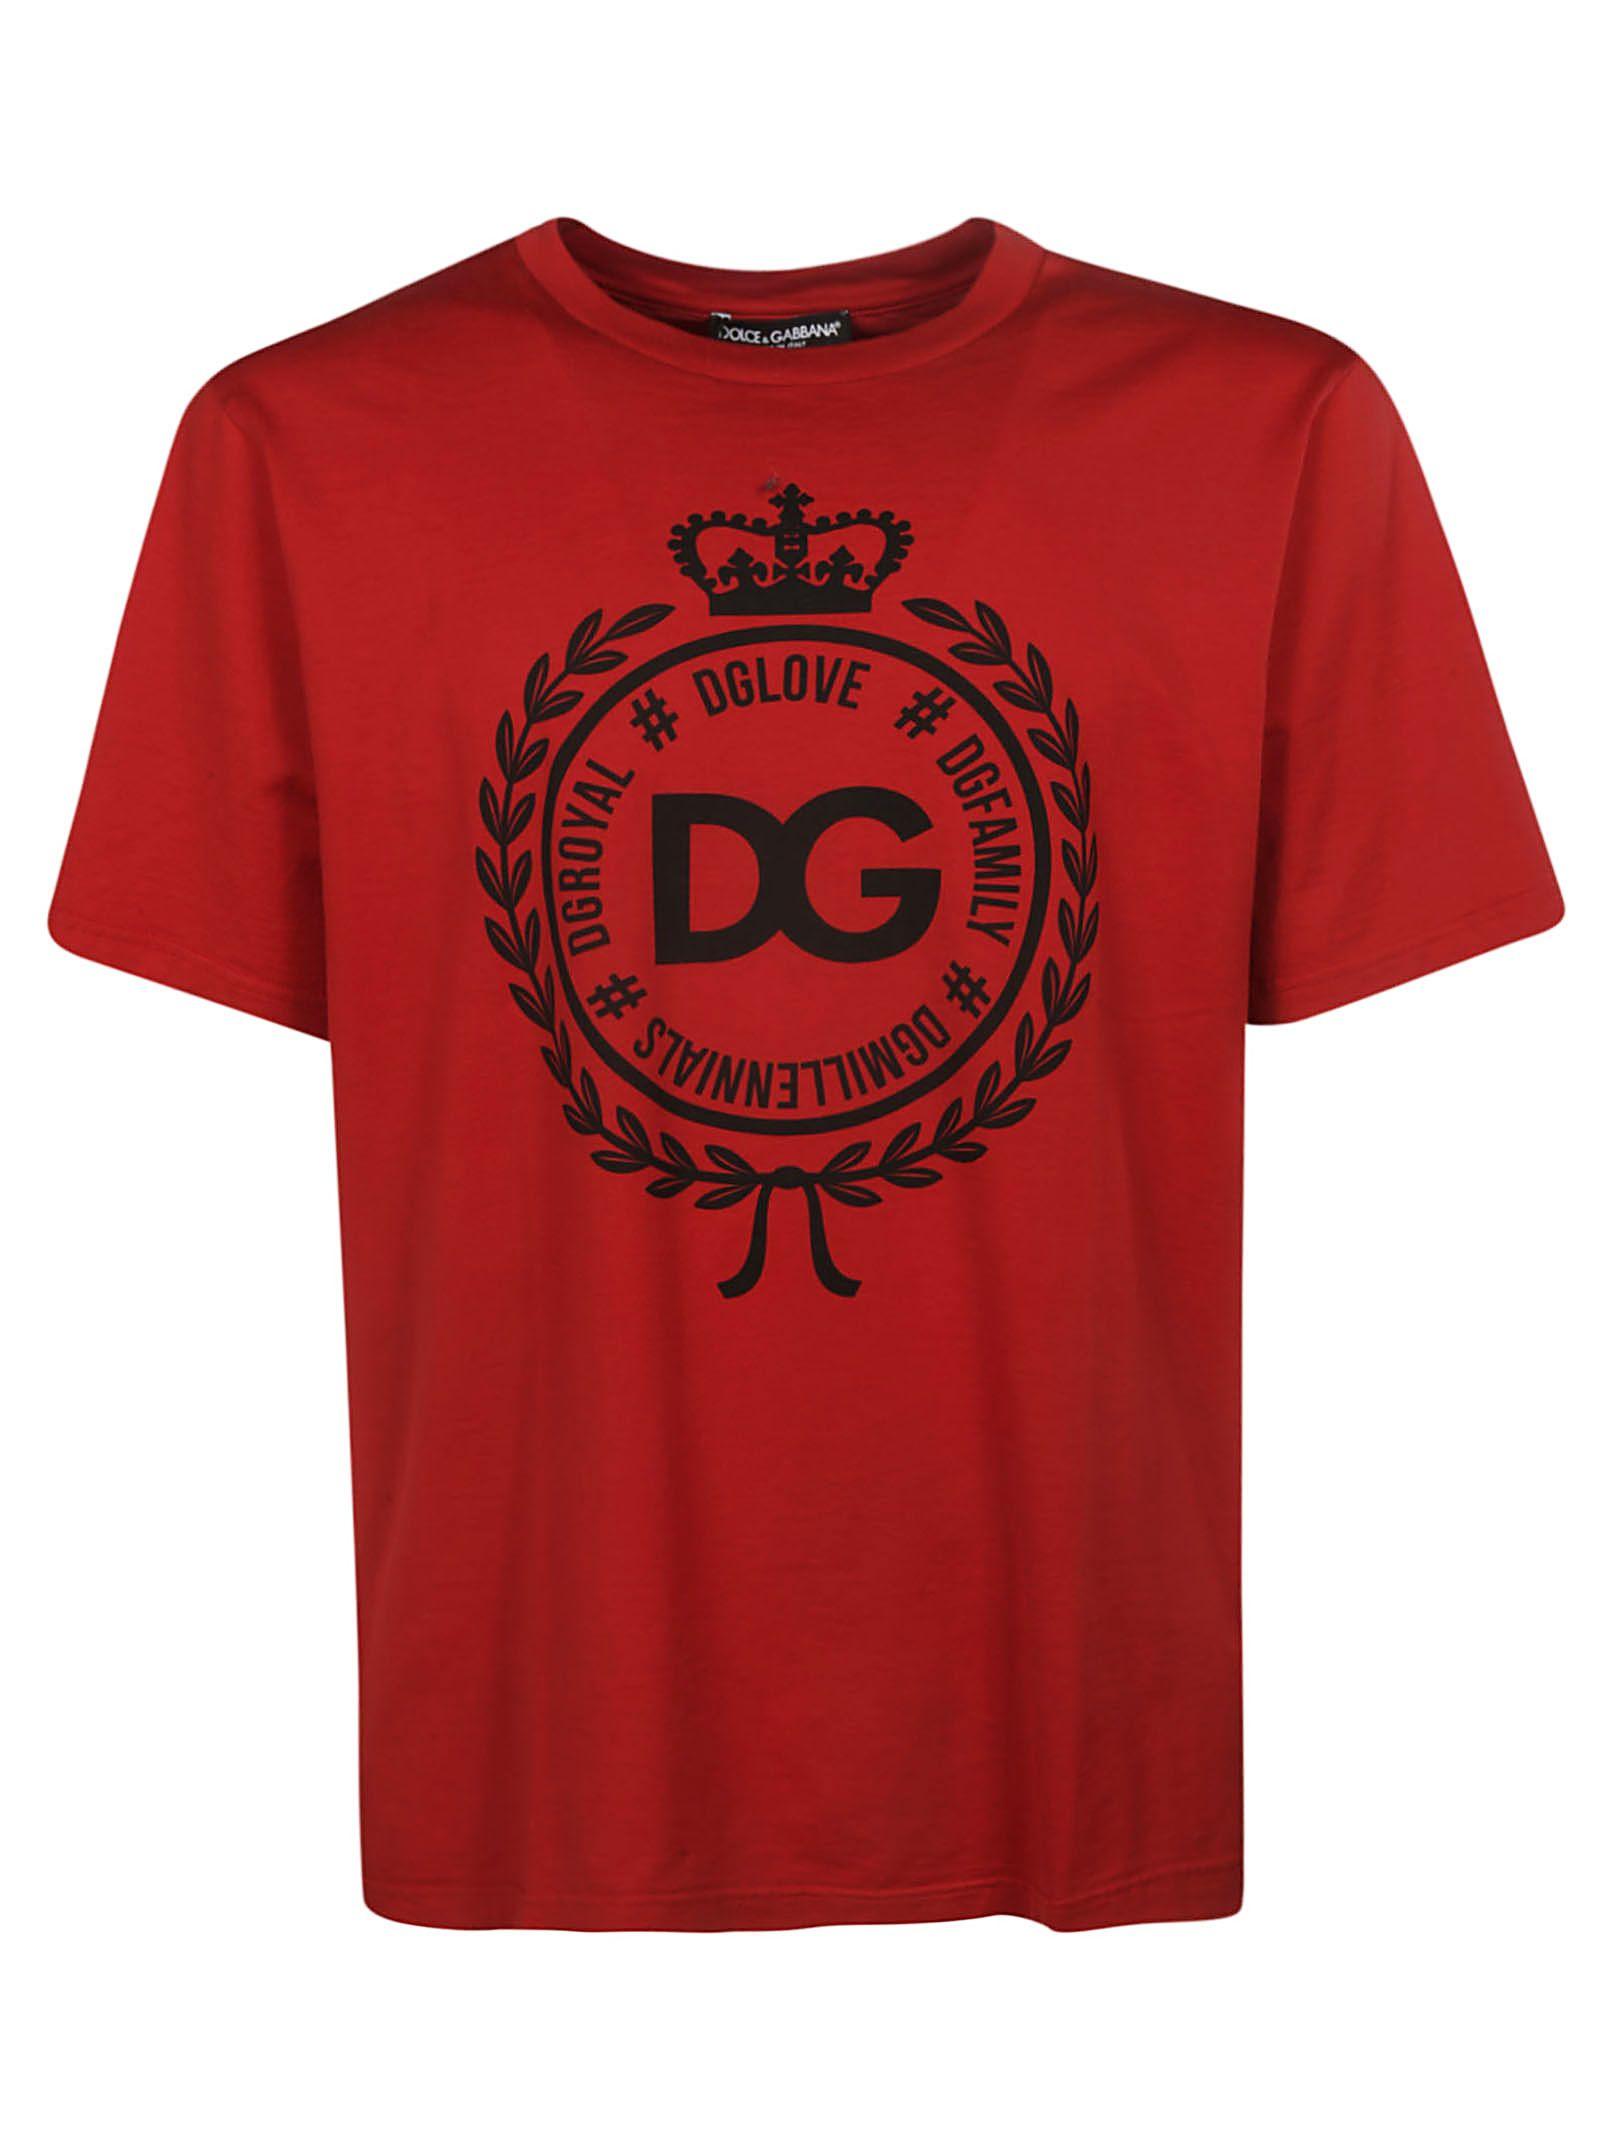 d791dff8ae89 Dolce   Gabbana Dolce   Gabbana Dg Crest Logo T-shirt - Red ...